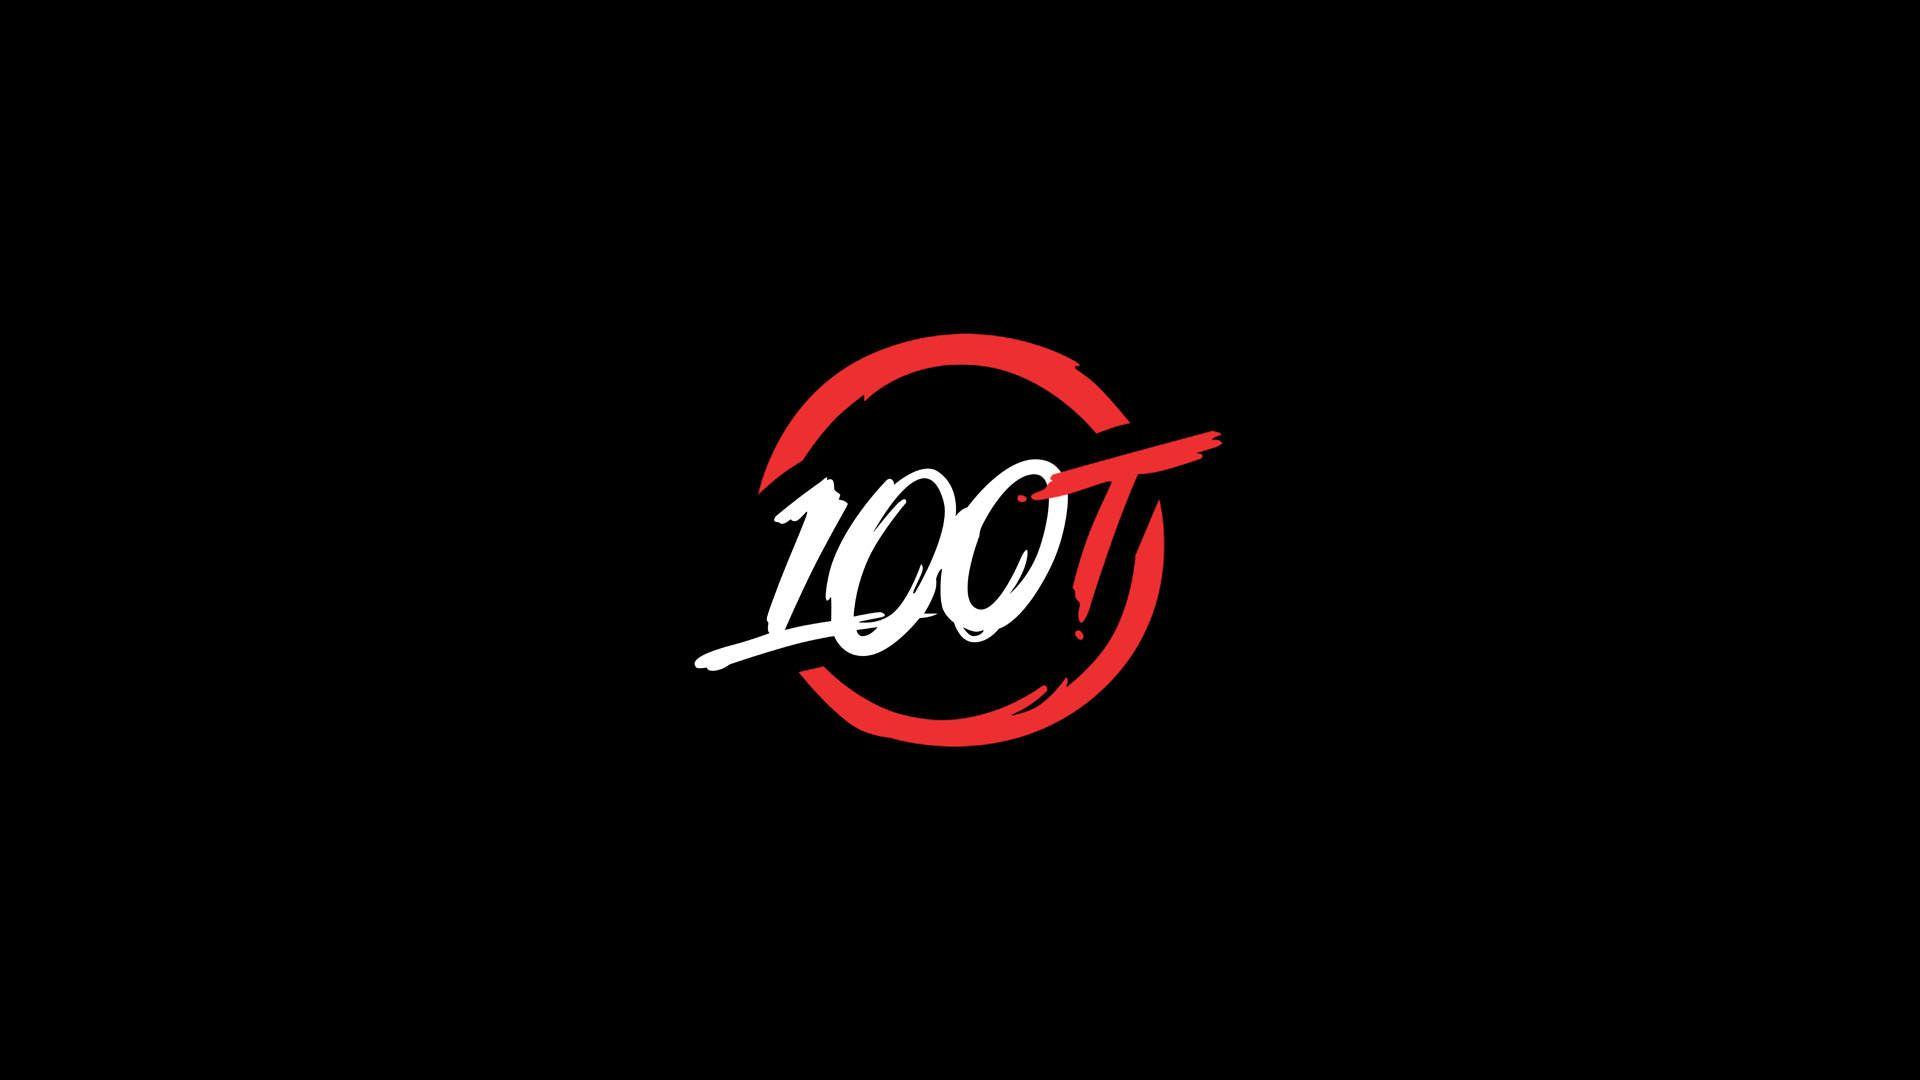 High Definition 100 Thieves Wallpaper